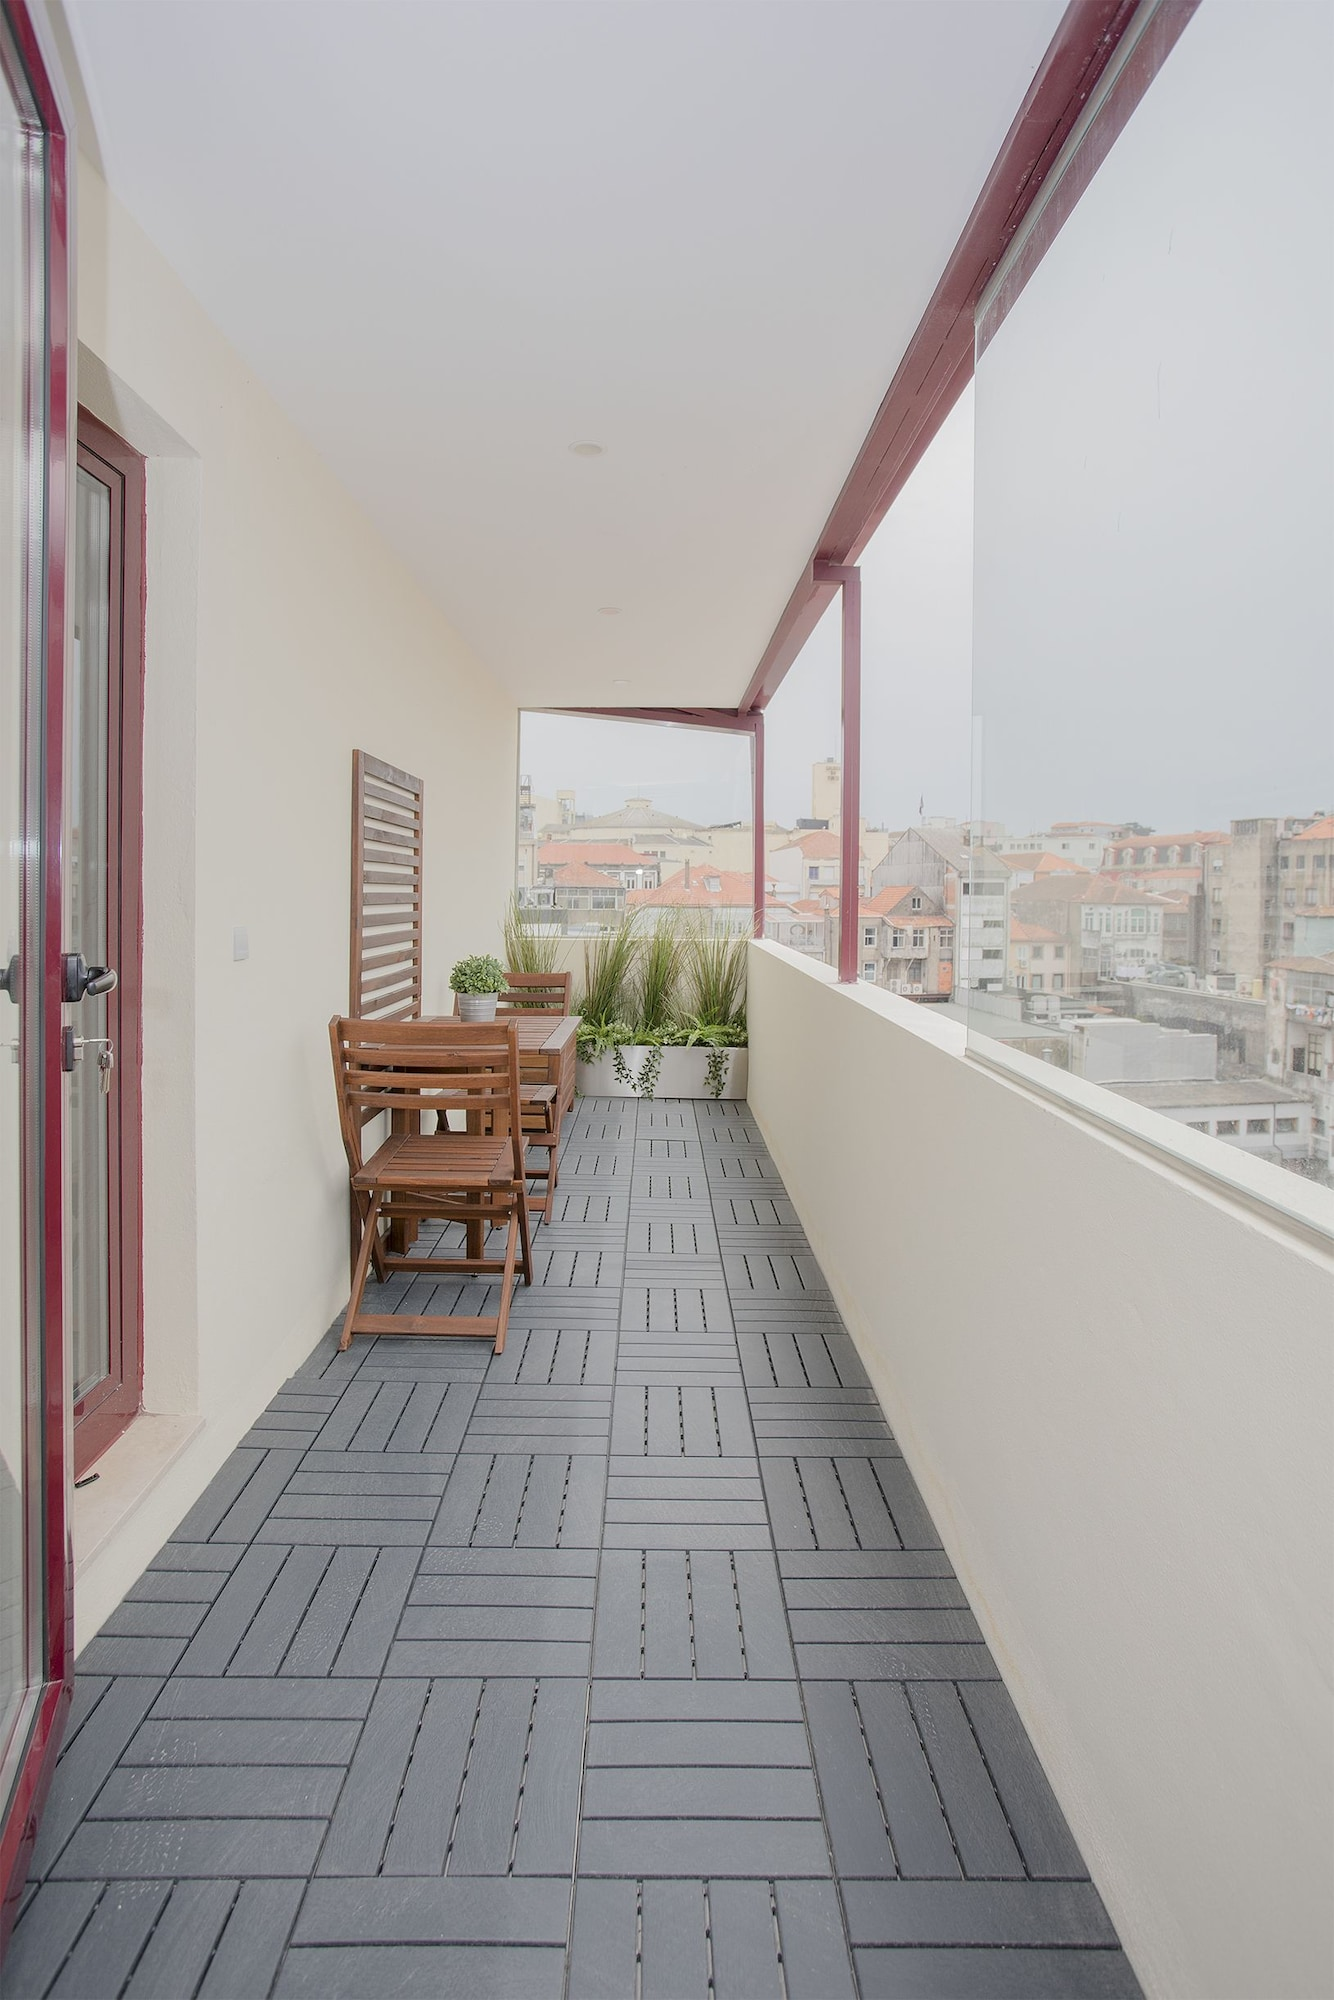 Liiiving - Invictus Bolhão Terrace Apts, Porto